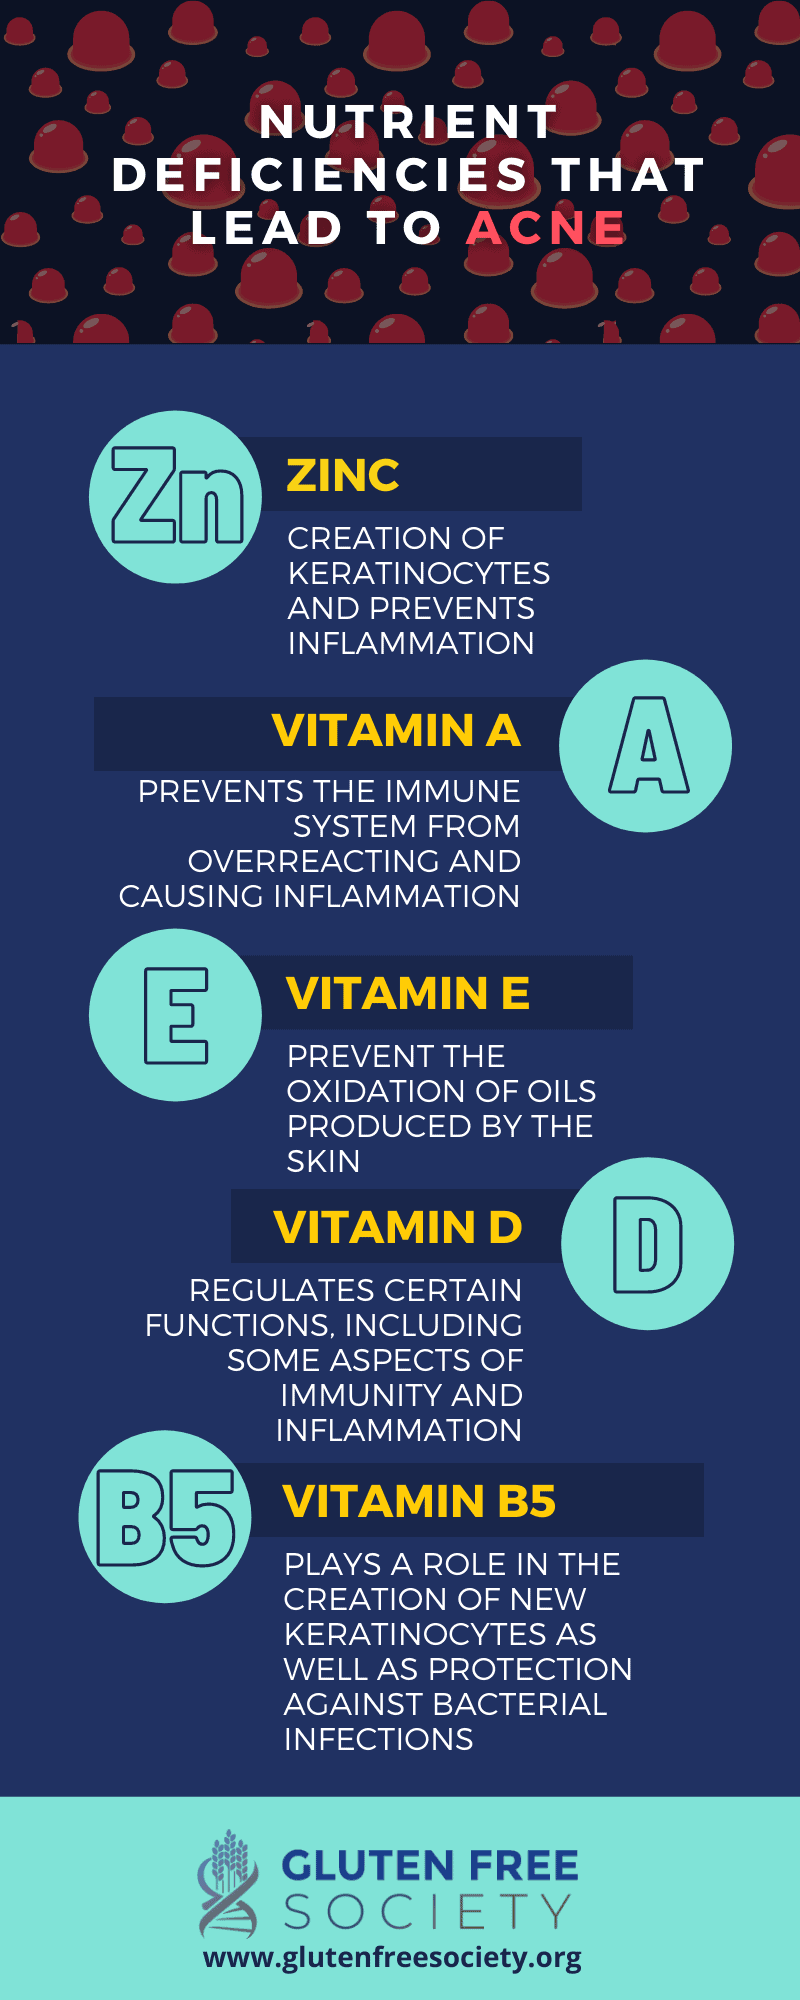 gluten acne and nutritional deficiencies